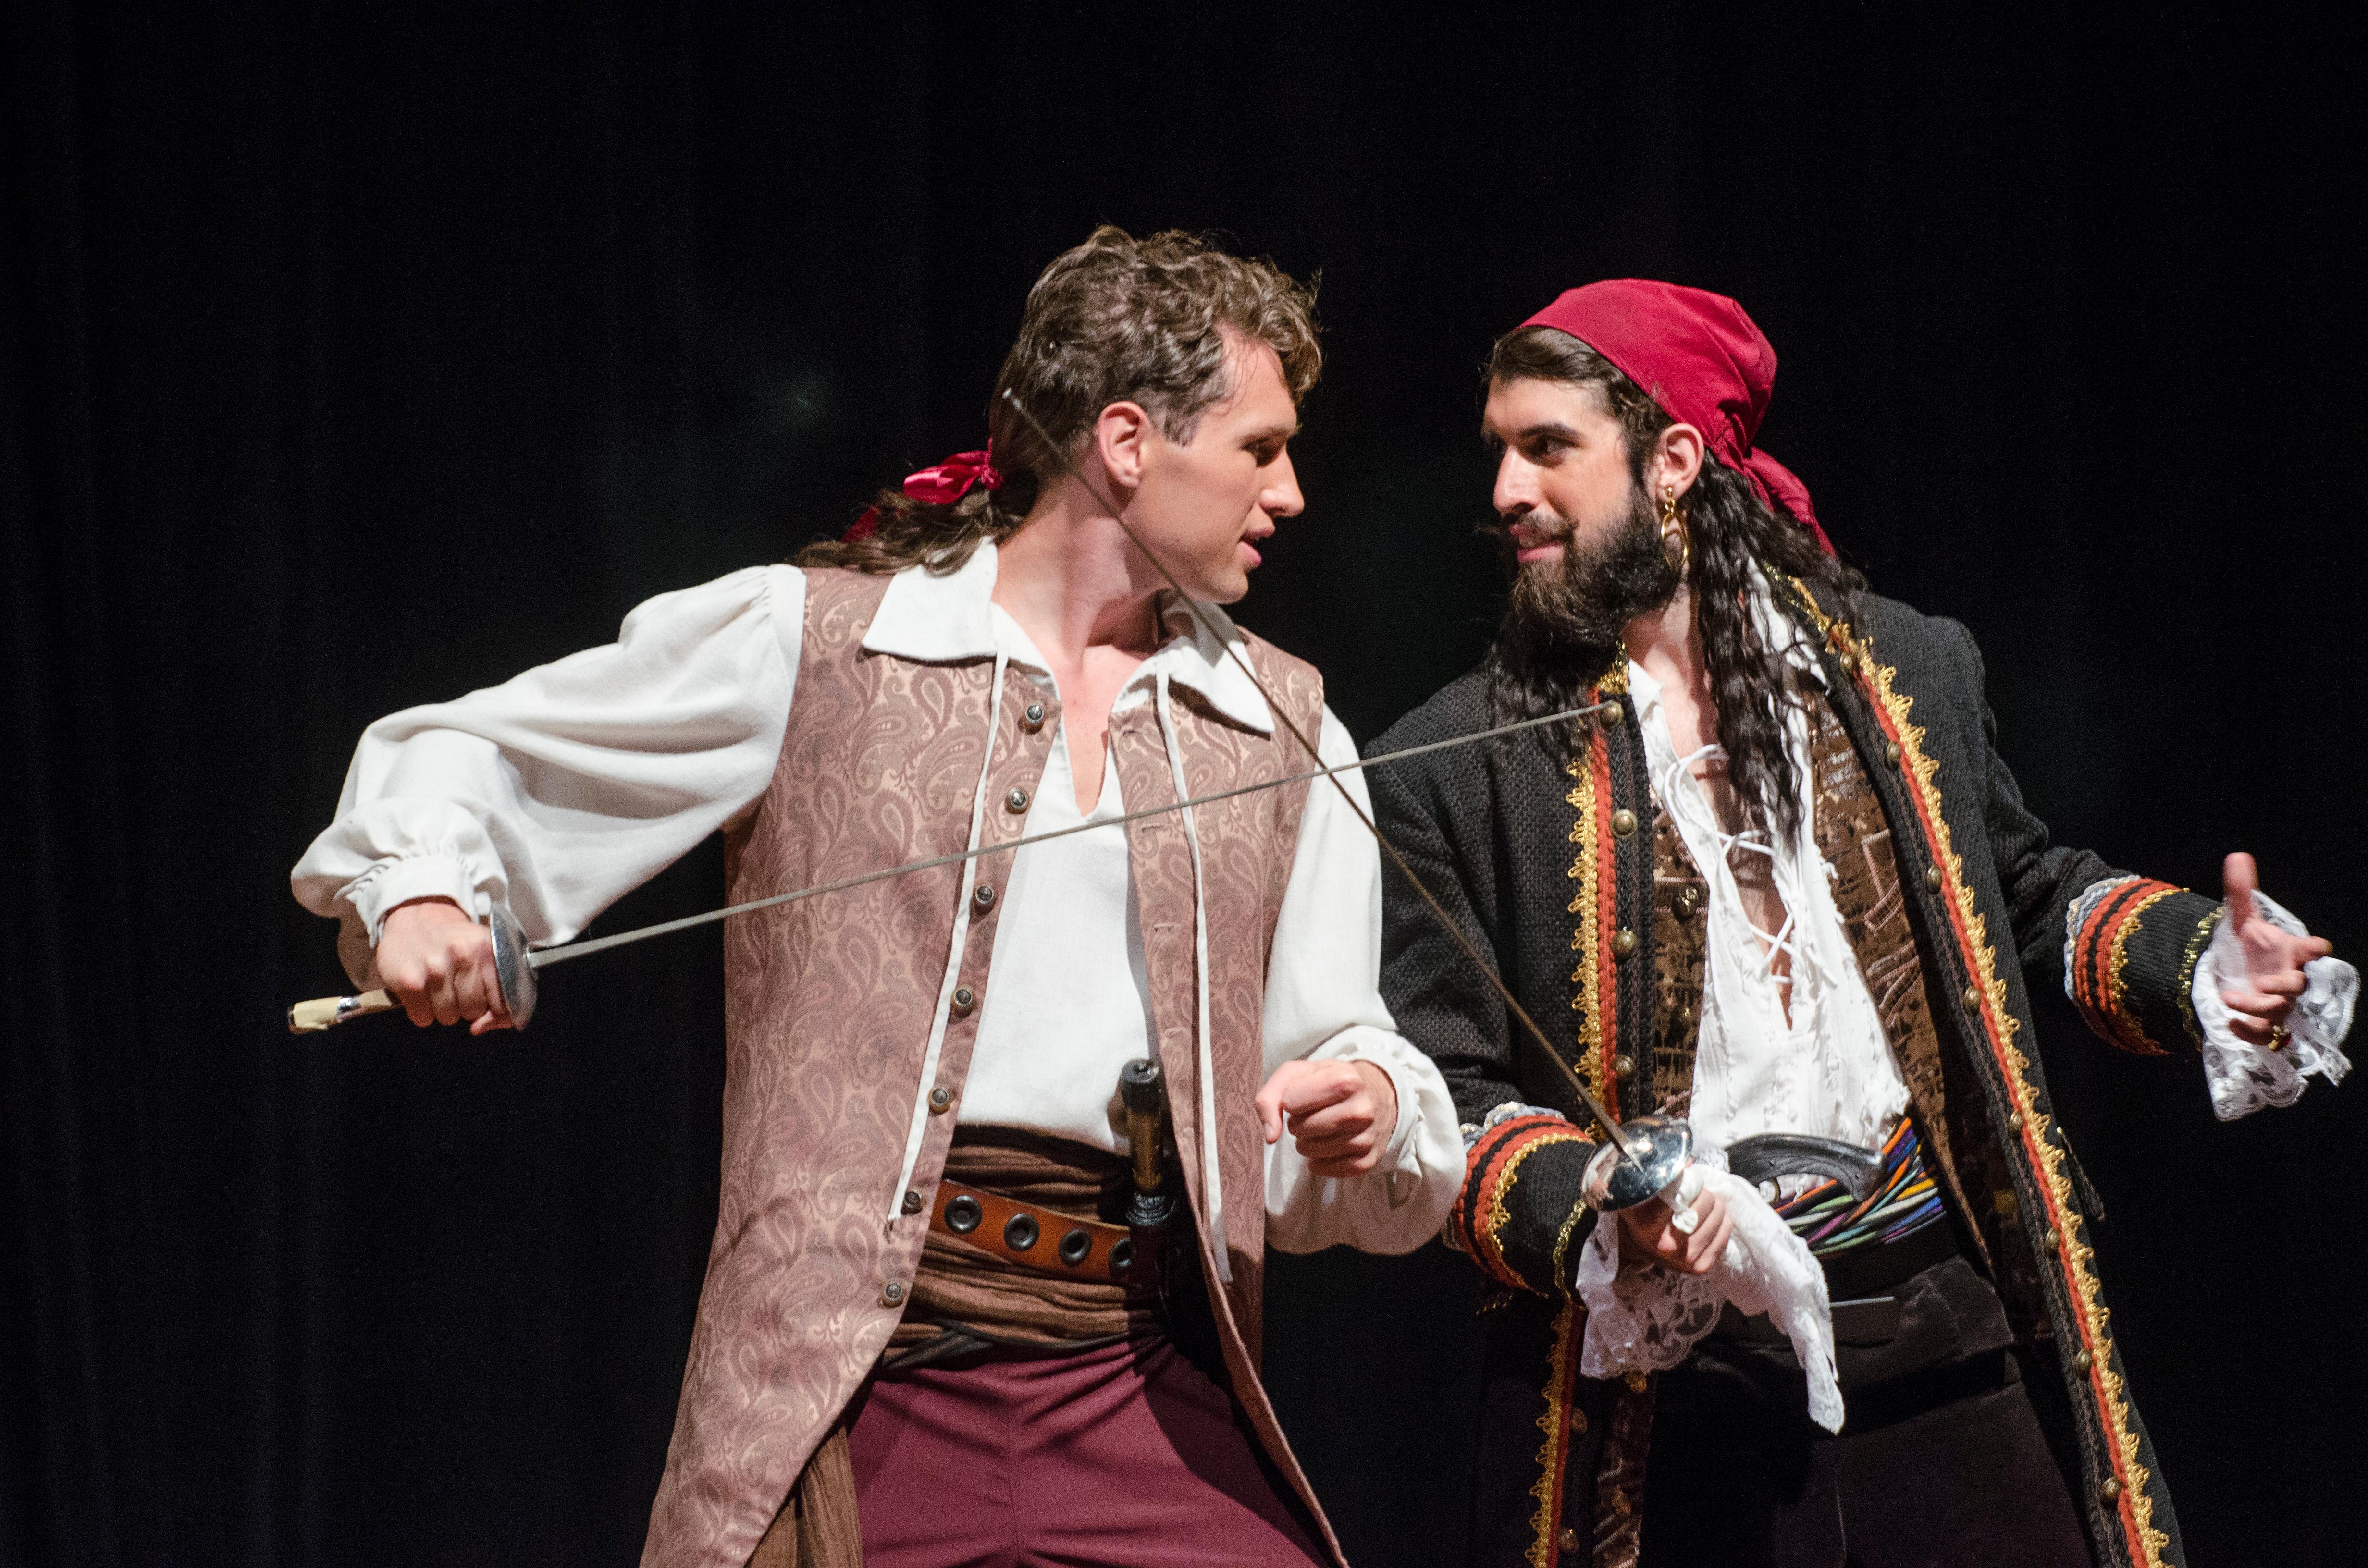 CU Boulder Pirates of Penzance